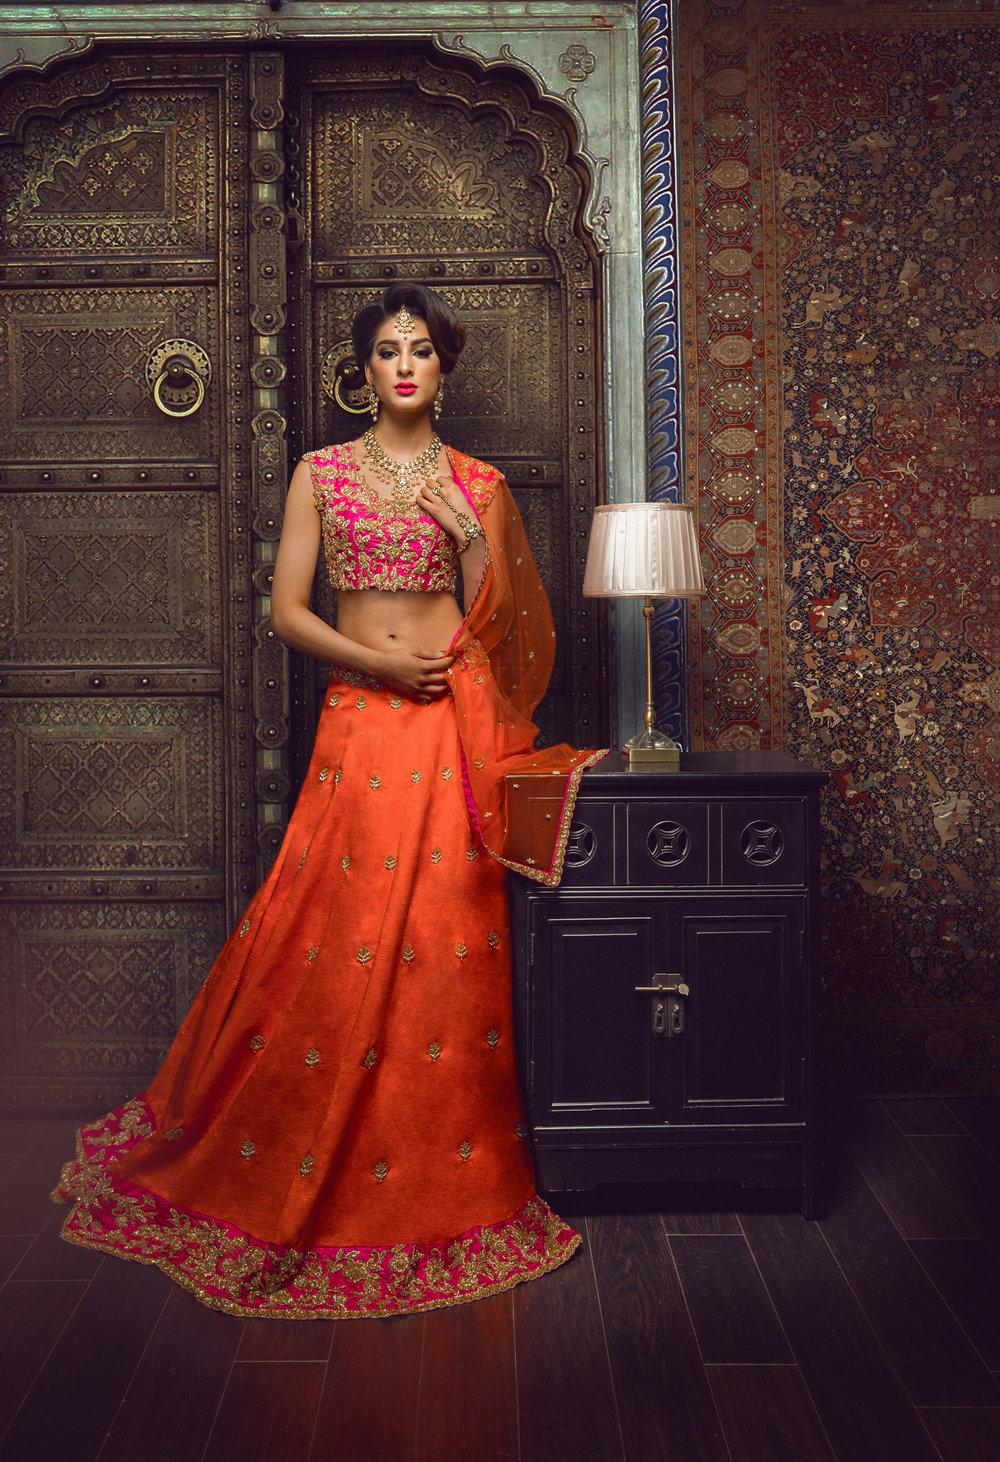 Orange & Pink Dress_LR_bk_LR.jpg